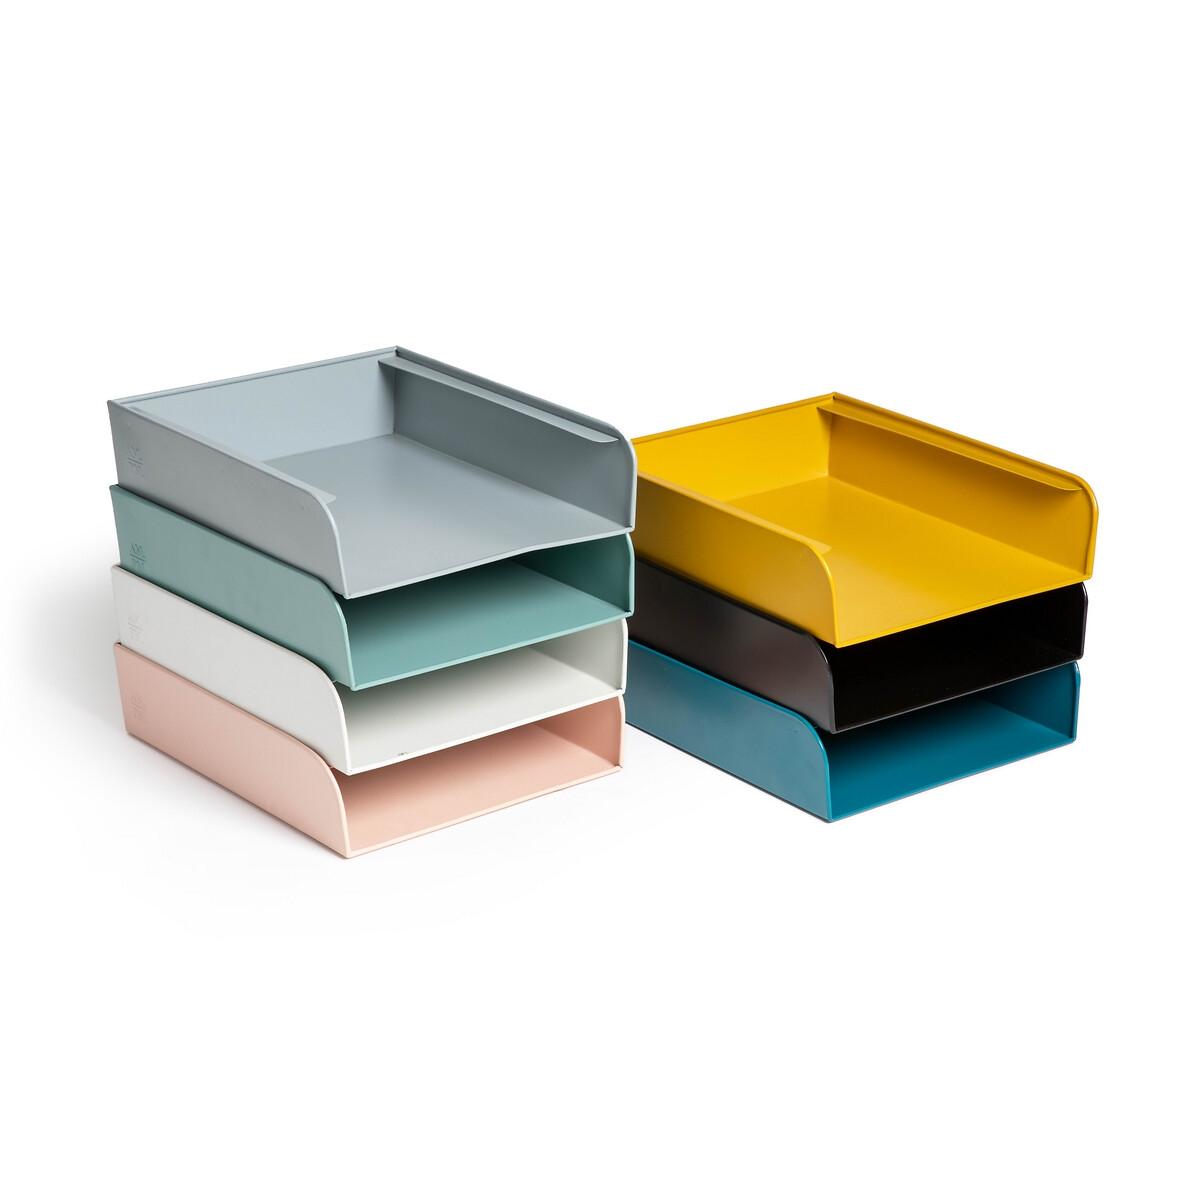 Image of Arreglo Metal Paper Tray